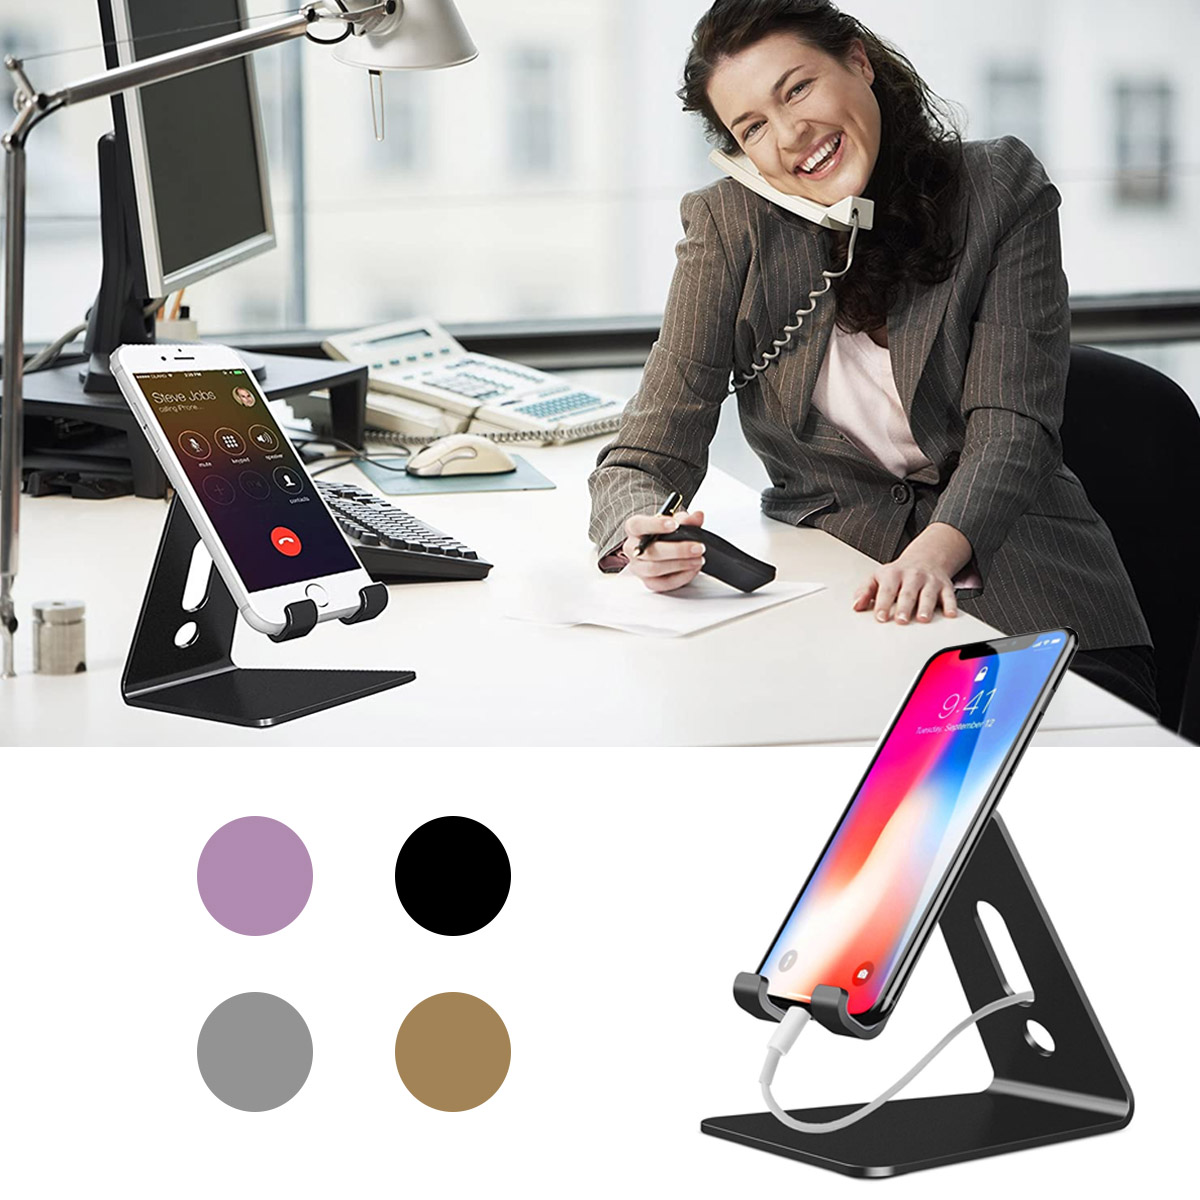 Soporte De Aluminio Portátil Para Celular Tablet IPad IPhone